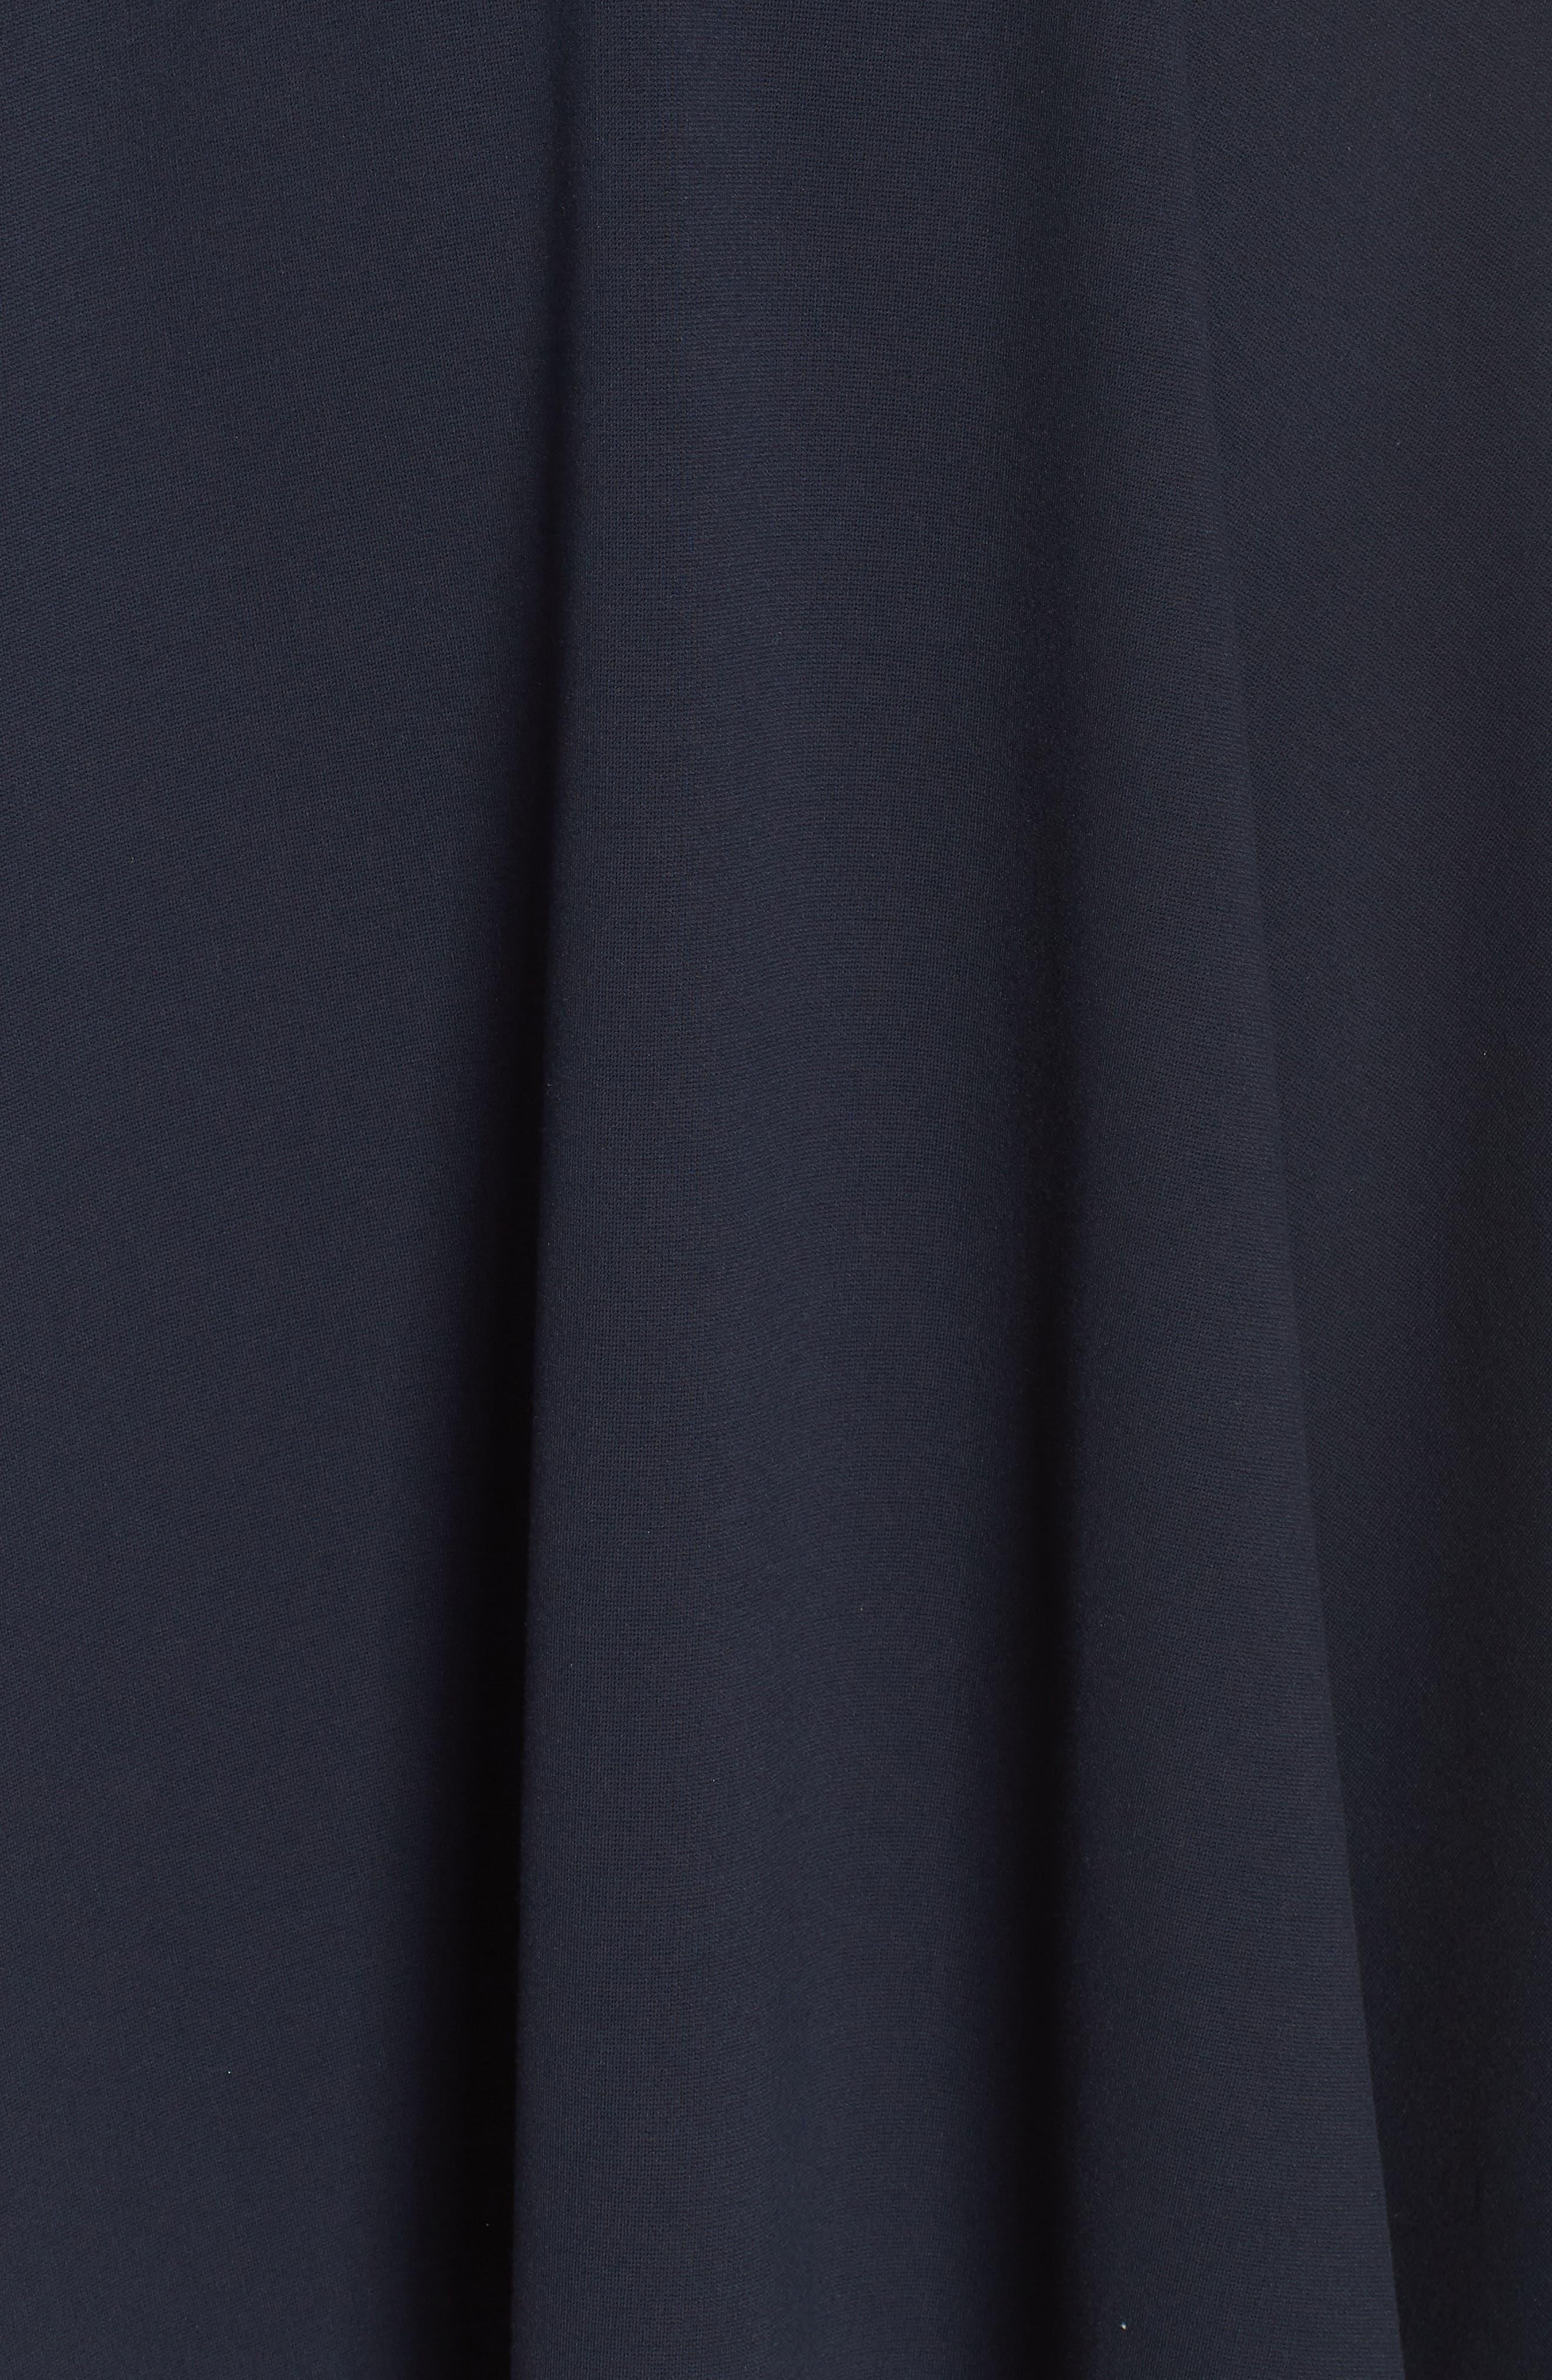 HARPER ROSE, Pleated Waist Fit & Flare Dress, Alternate thumbnail 7, color, 410